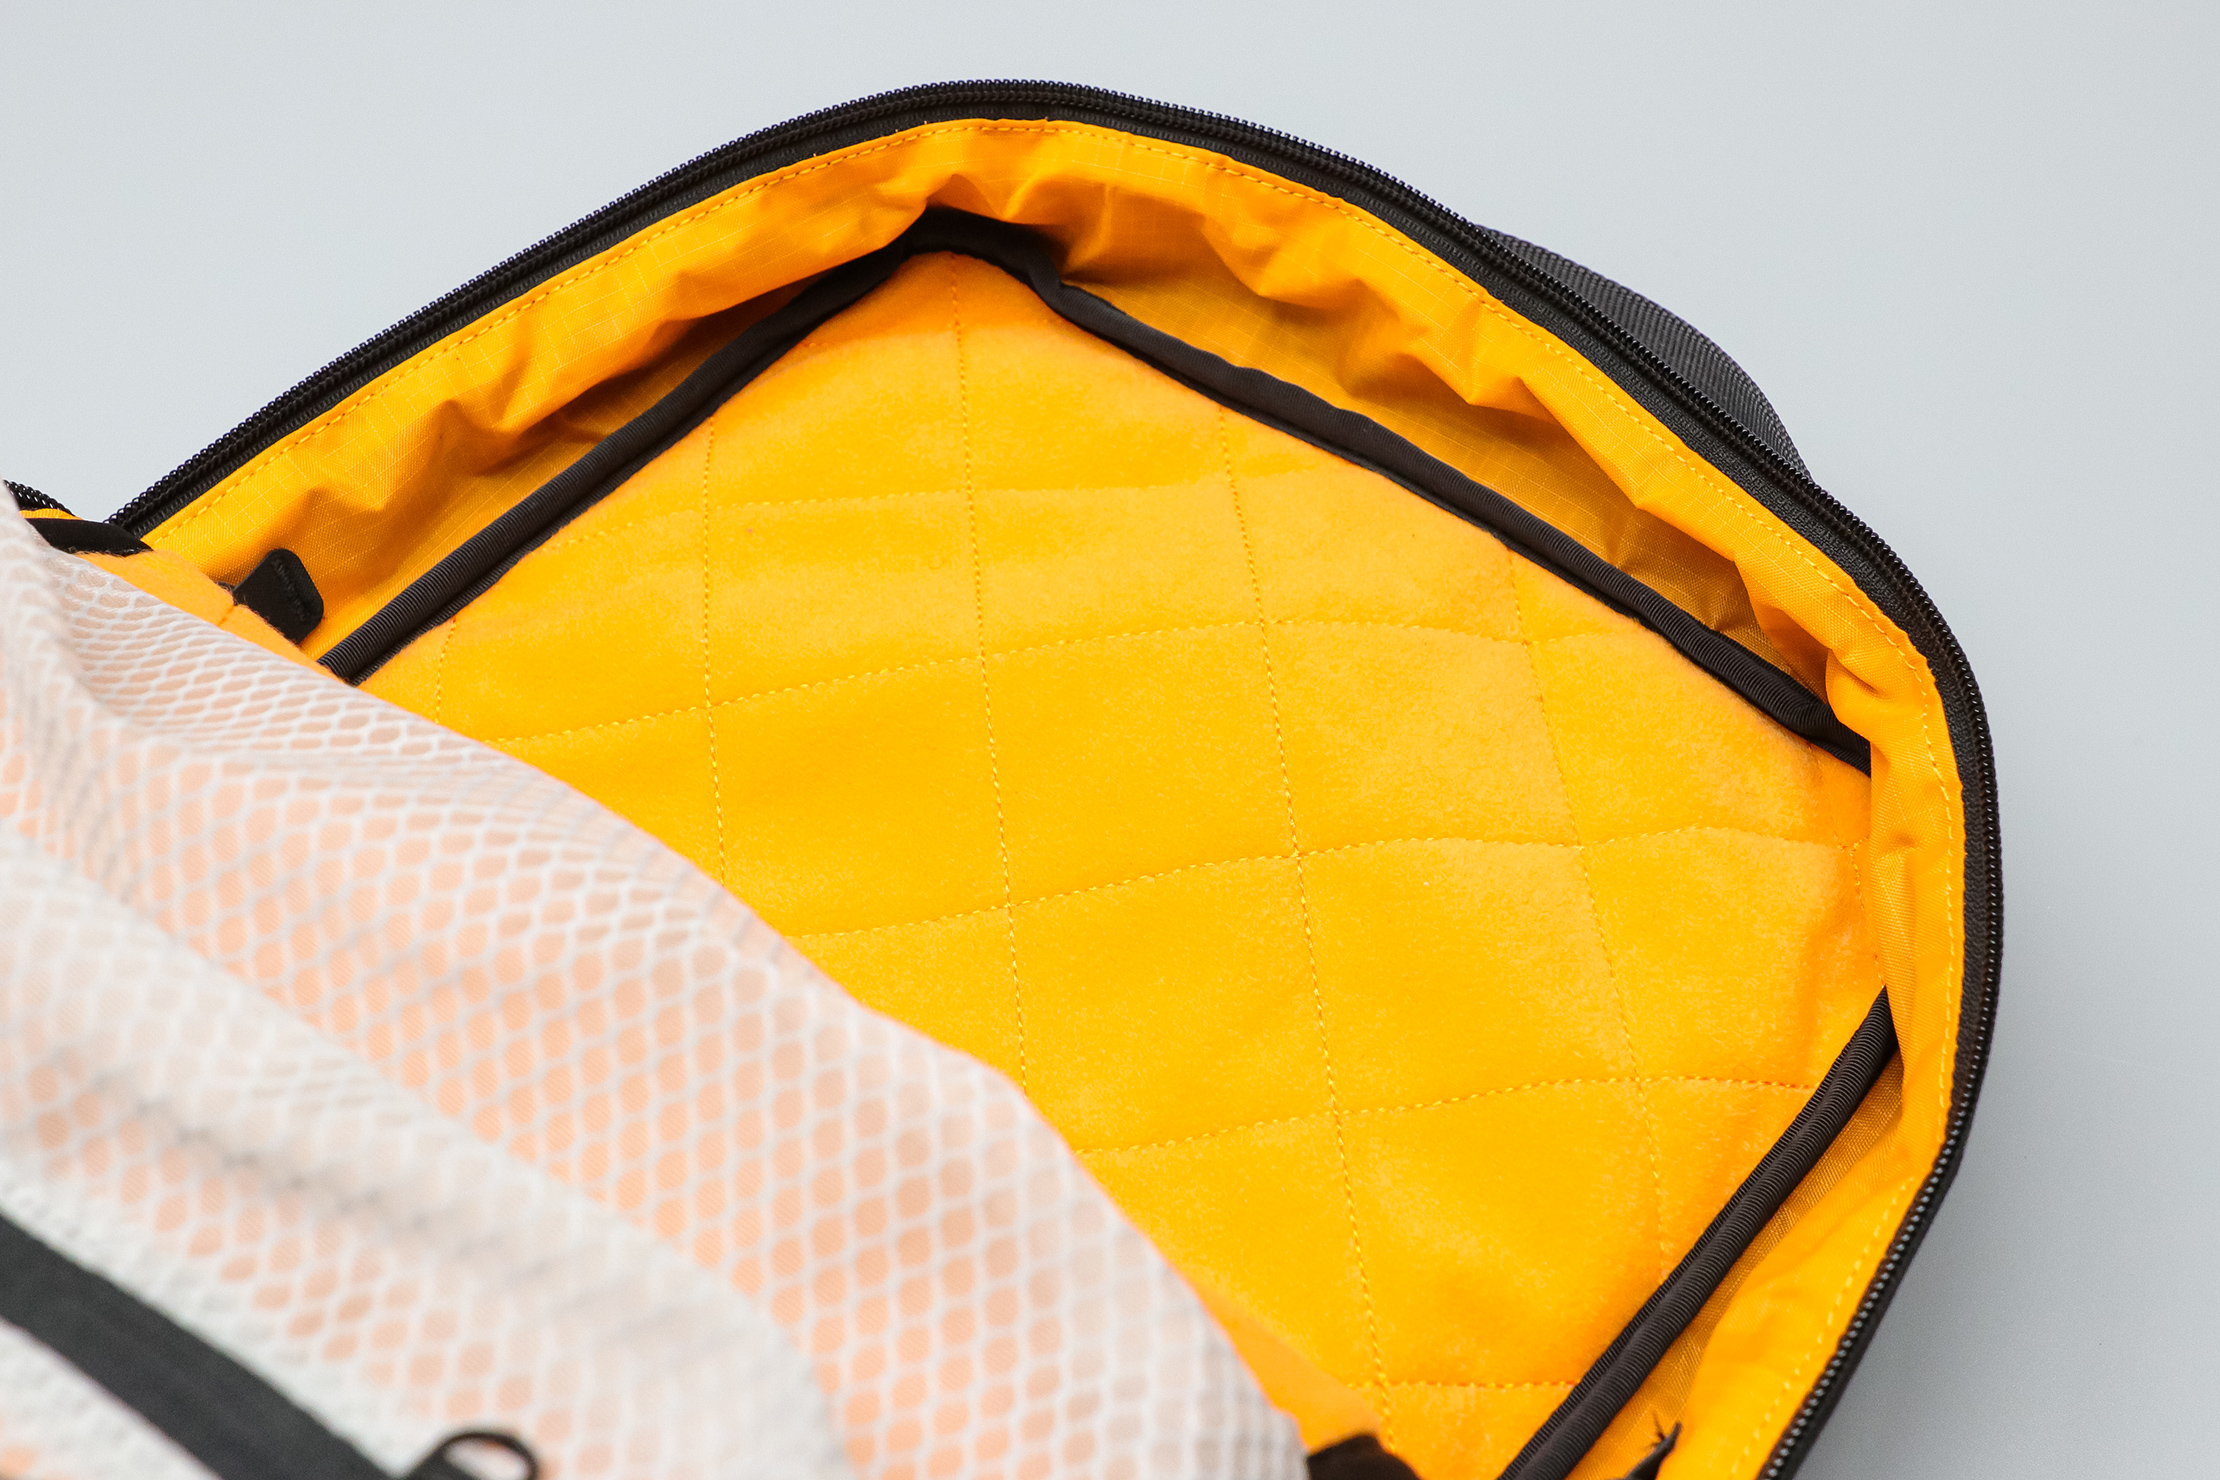 Vanquest ADDAX-18 Backpack interior liner